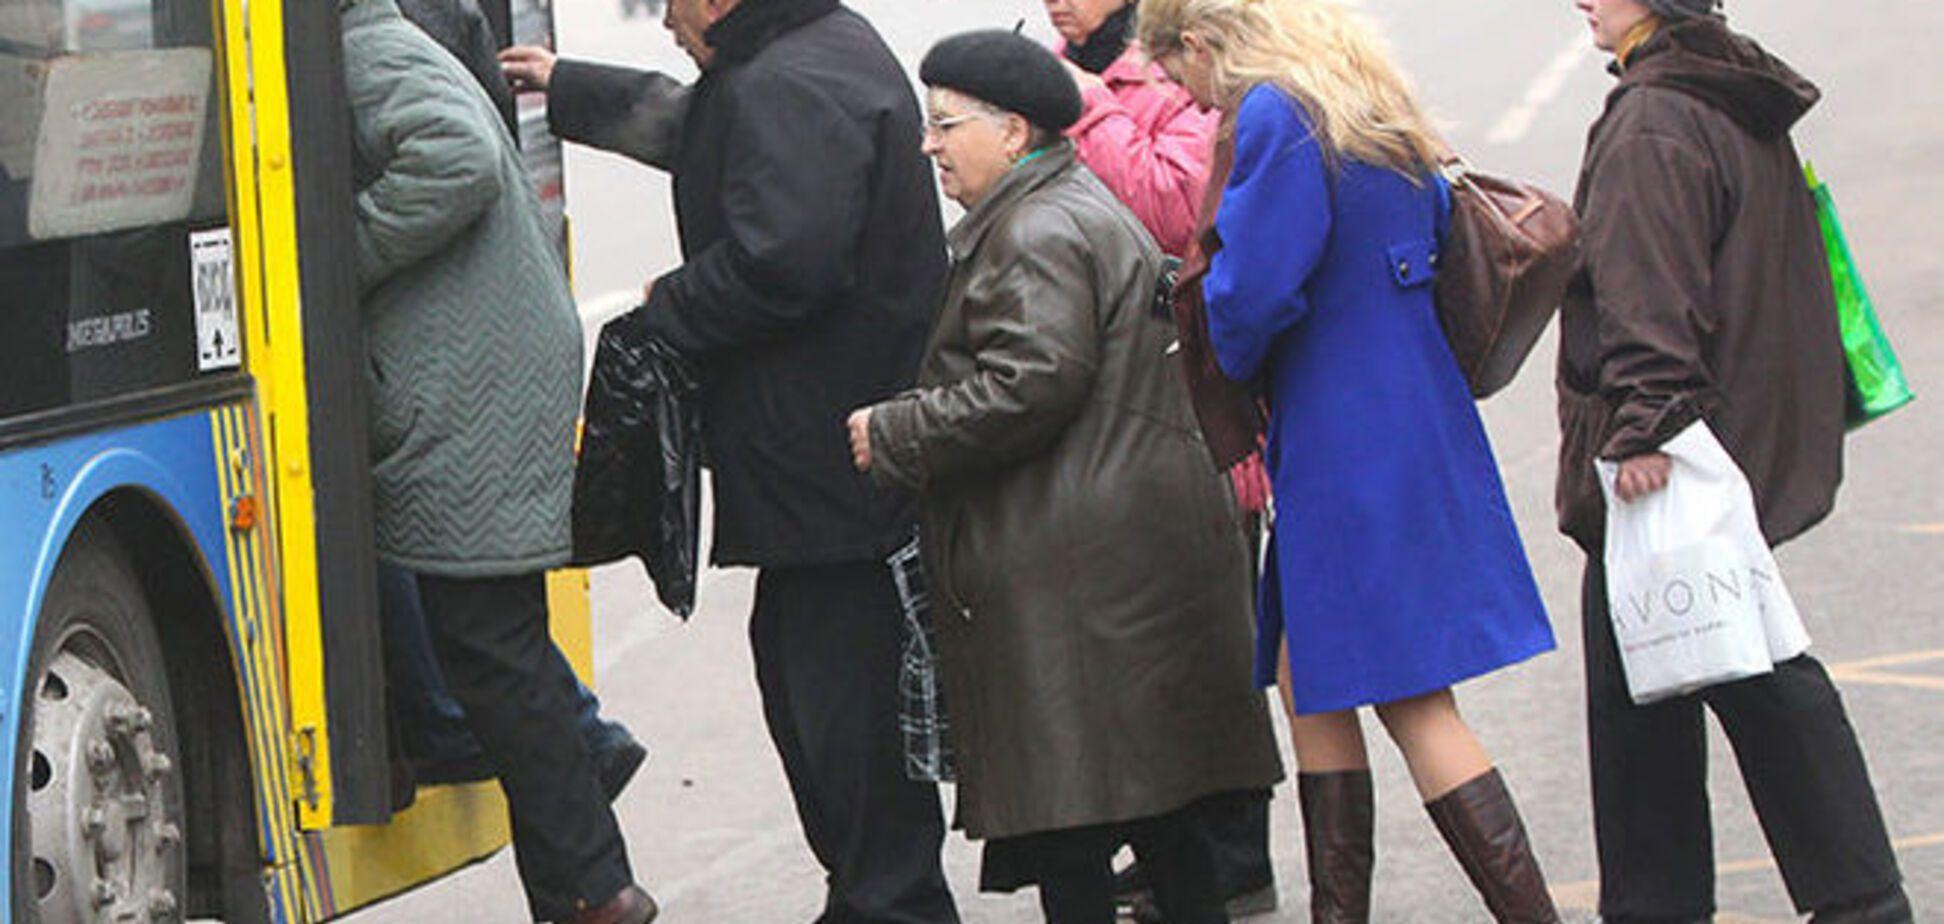 Киеврада лишит льгот на проезд 368 тыс. человек, силовики не пострадают